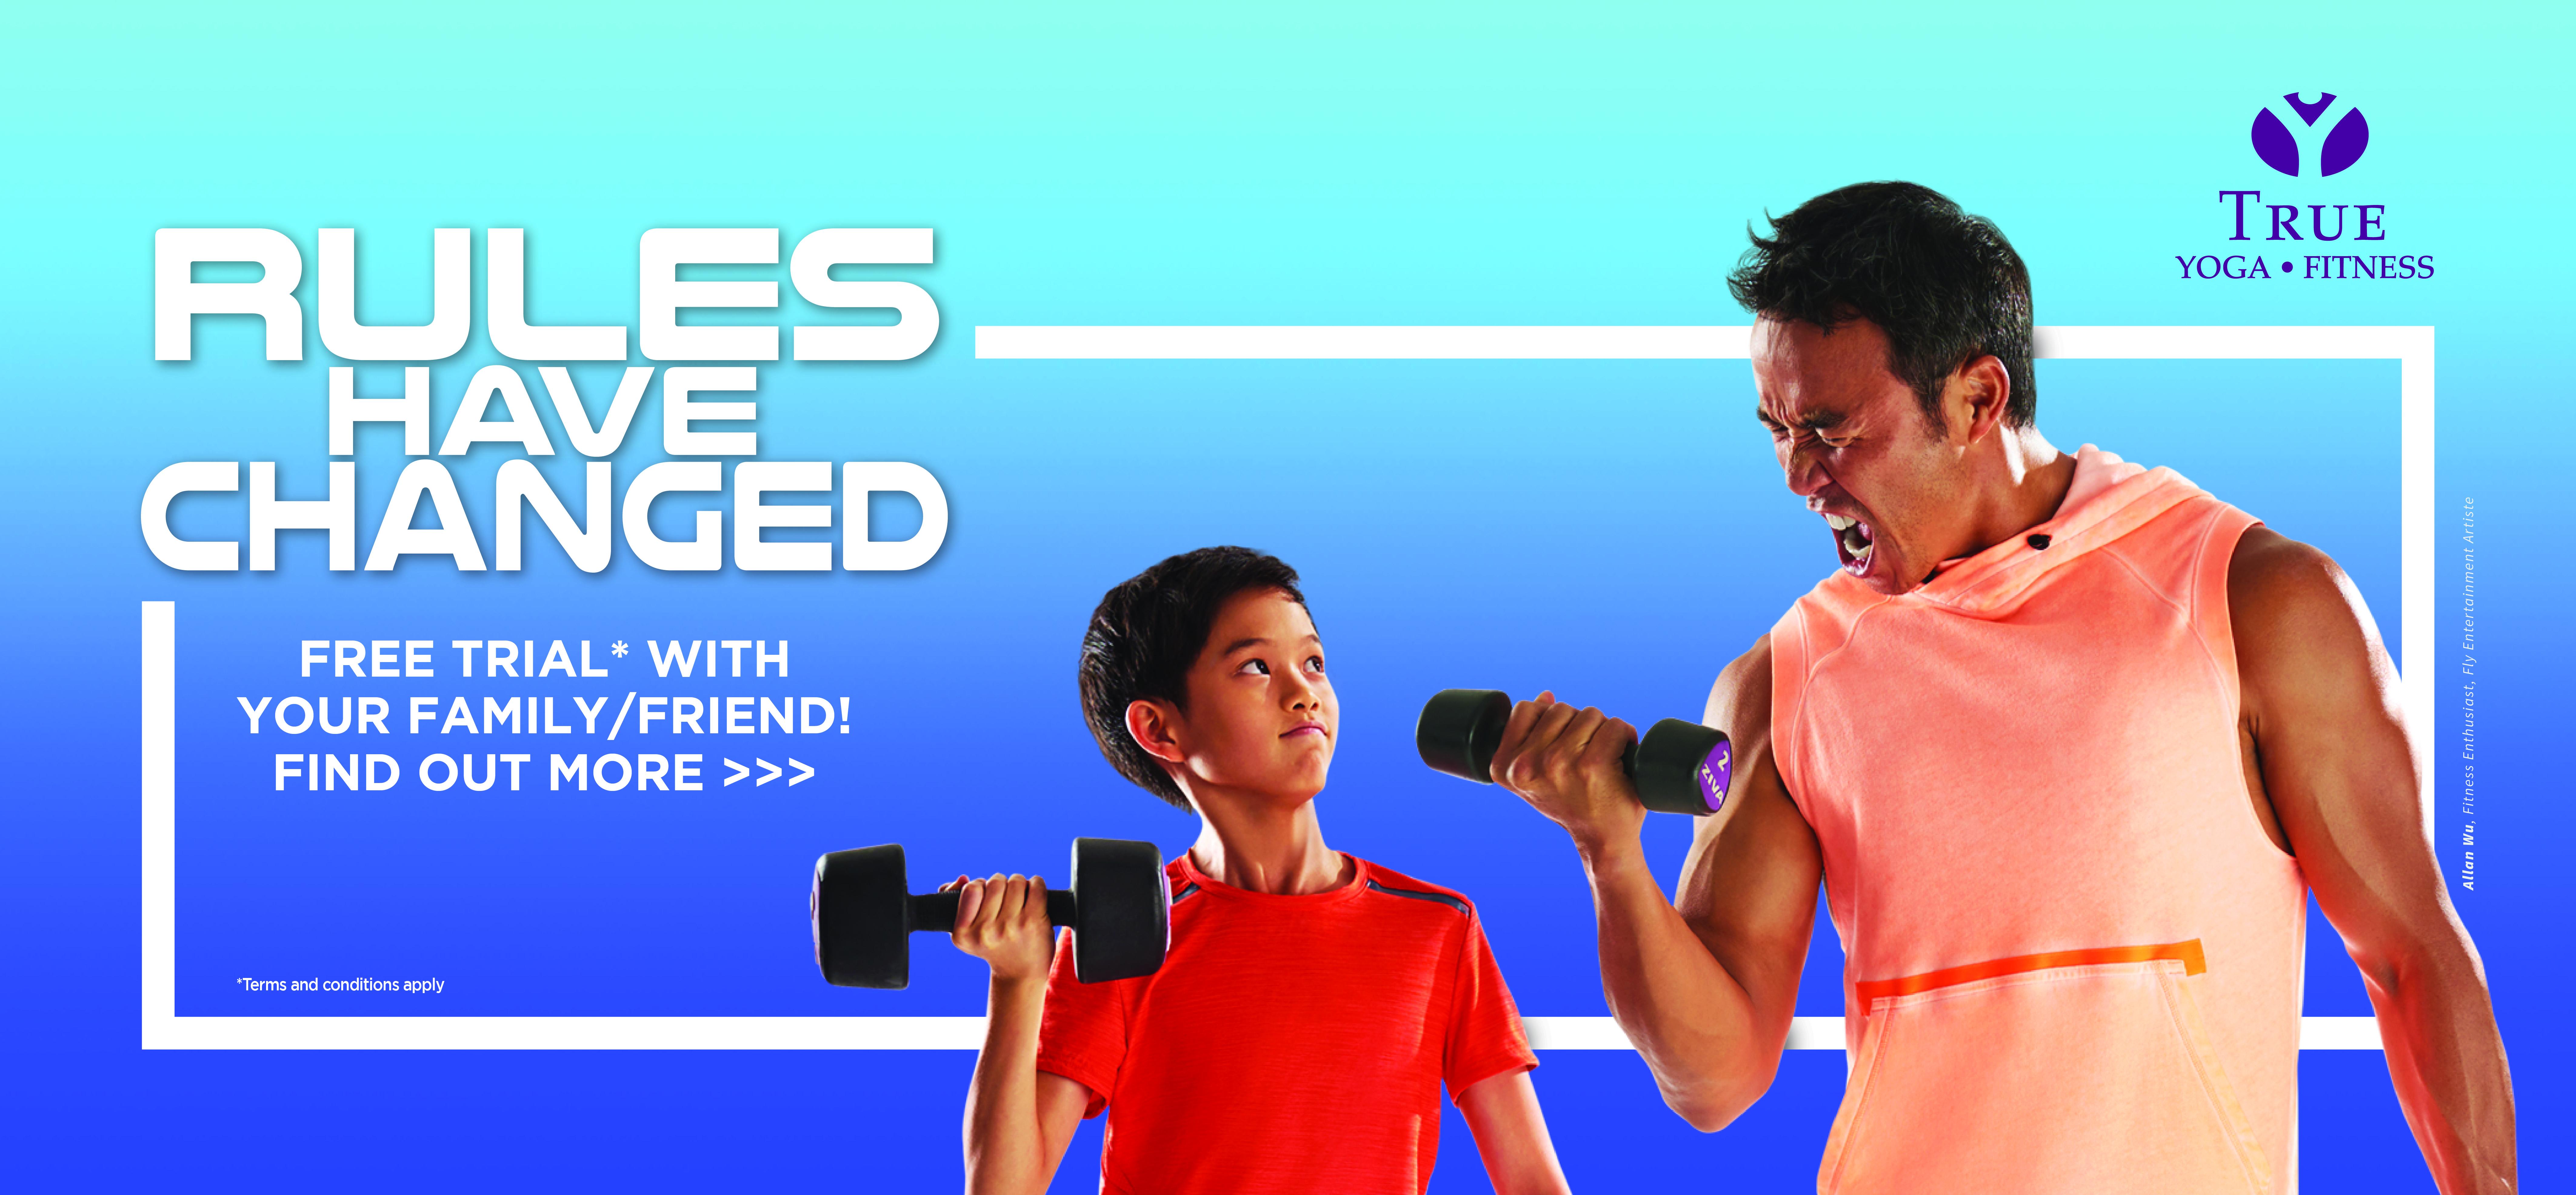 True Fitness Singapore - 8 Gyms island wide